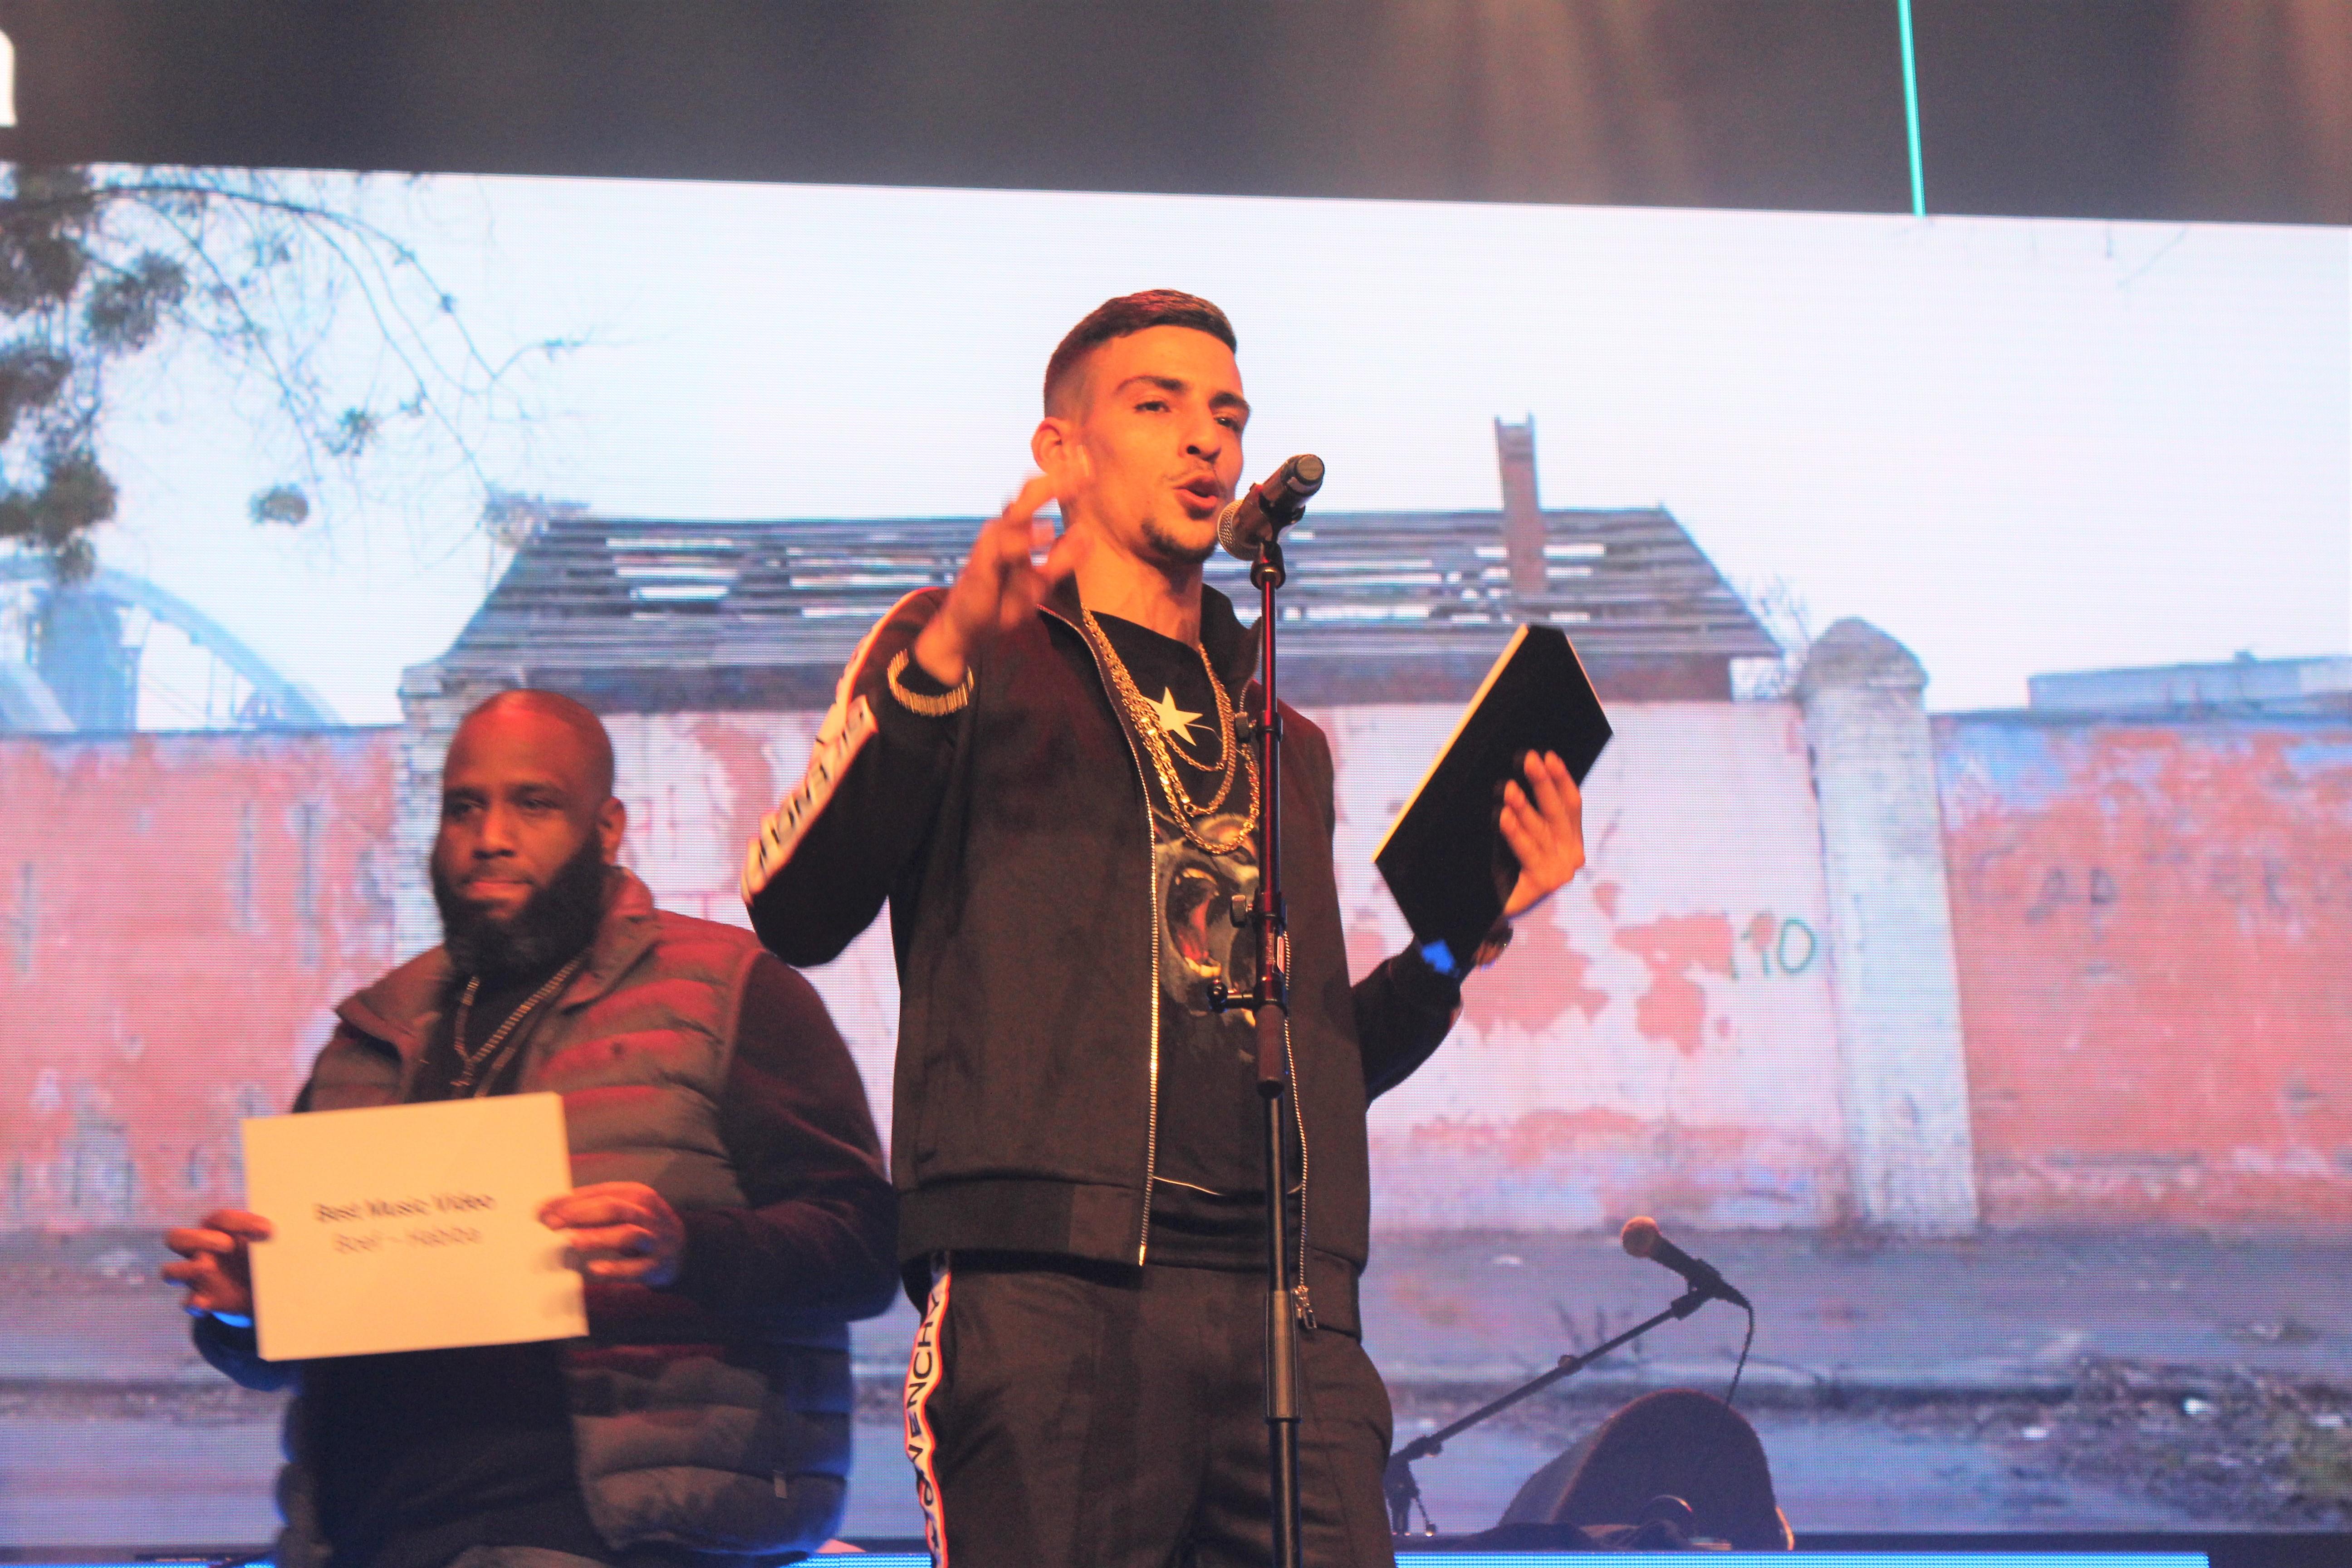 Boef @ XITE Awards - Fotocredits: Chenneti Ascencion Artiestennieuws